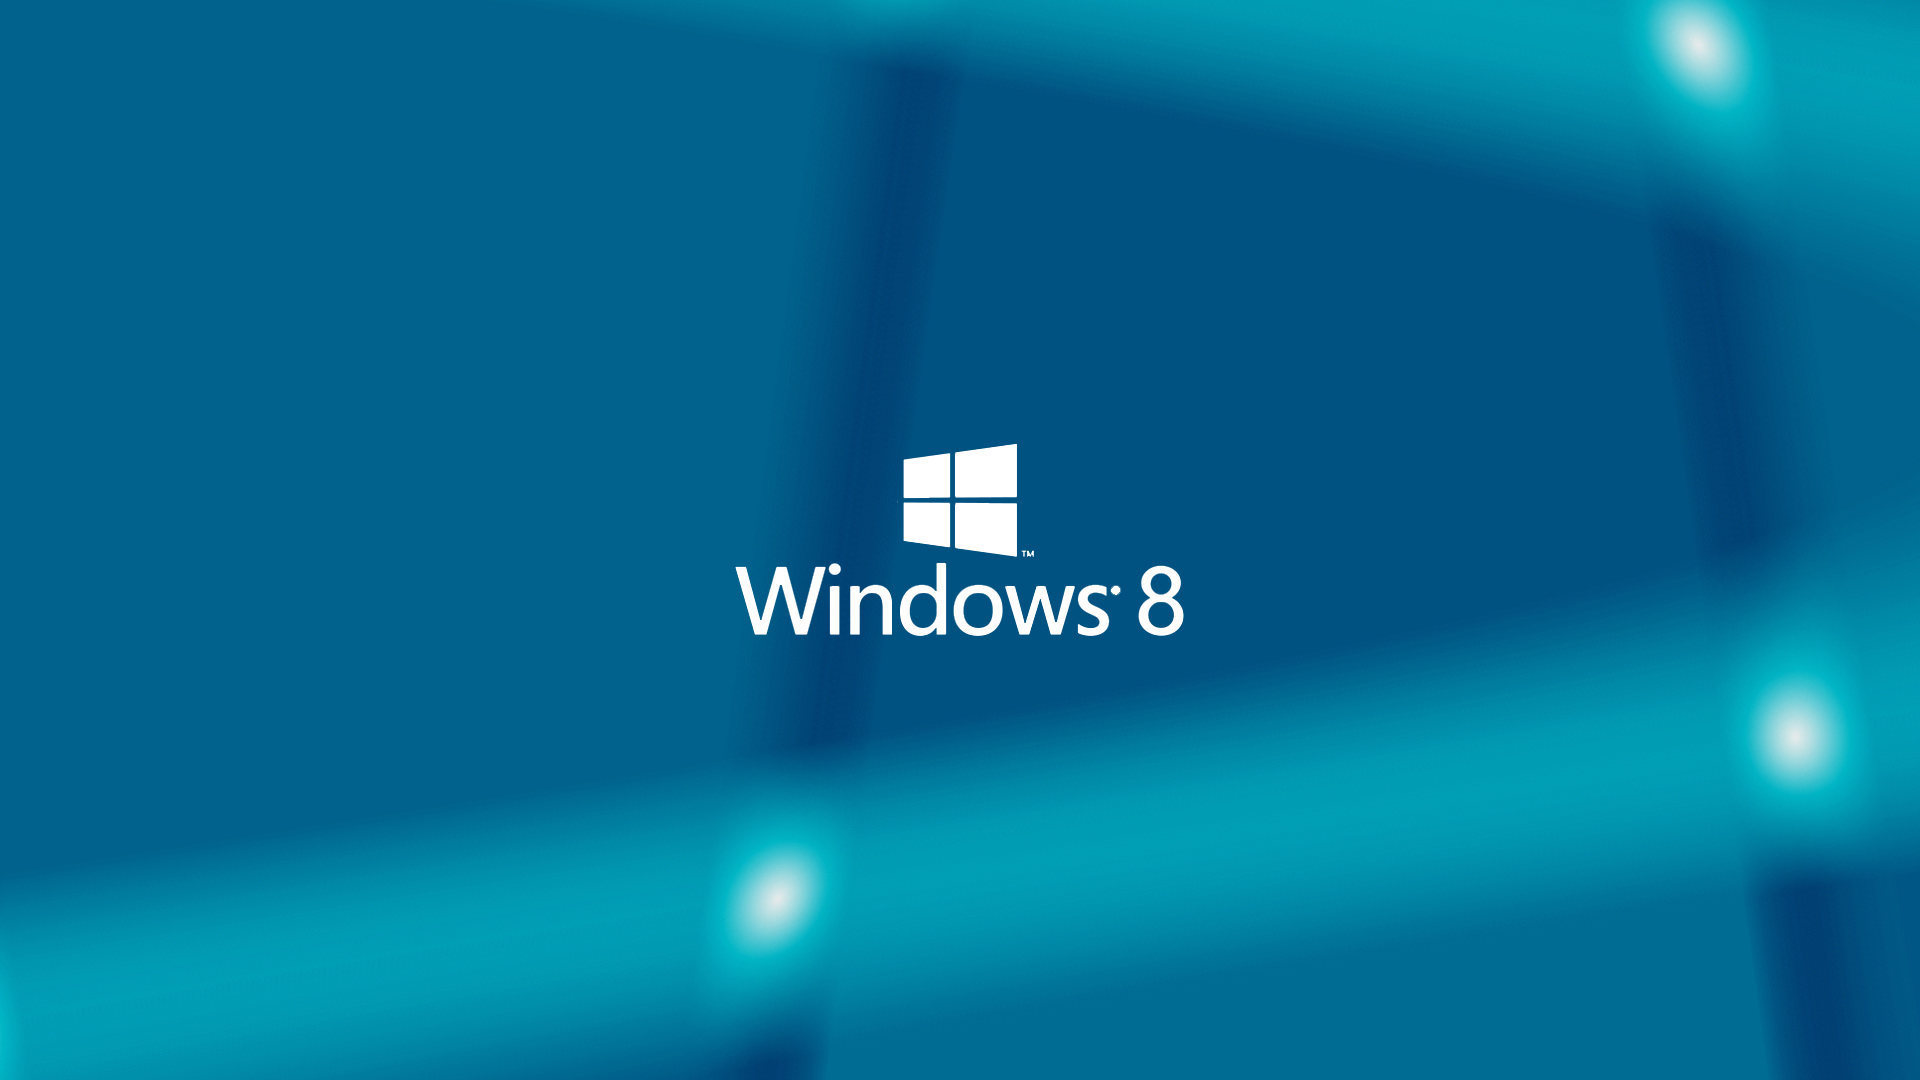 Windows 8 Blue Background Teal desktop wallpaper WallpaperPixel 1920x1080